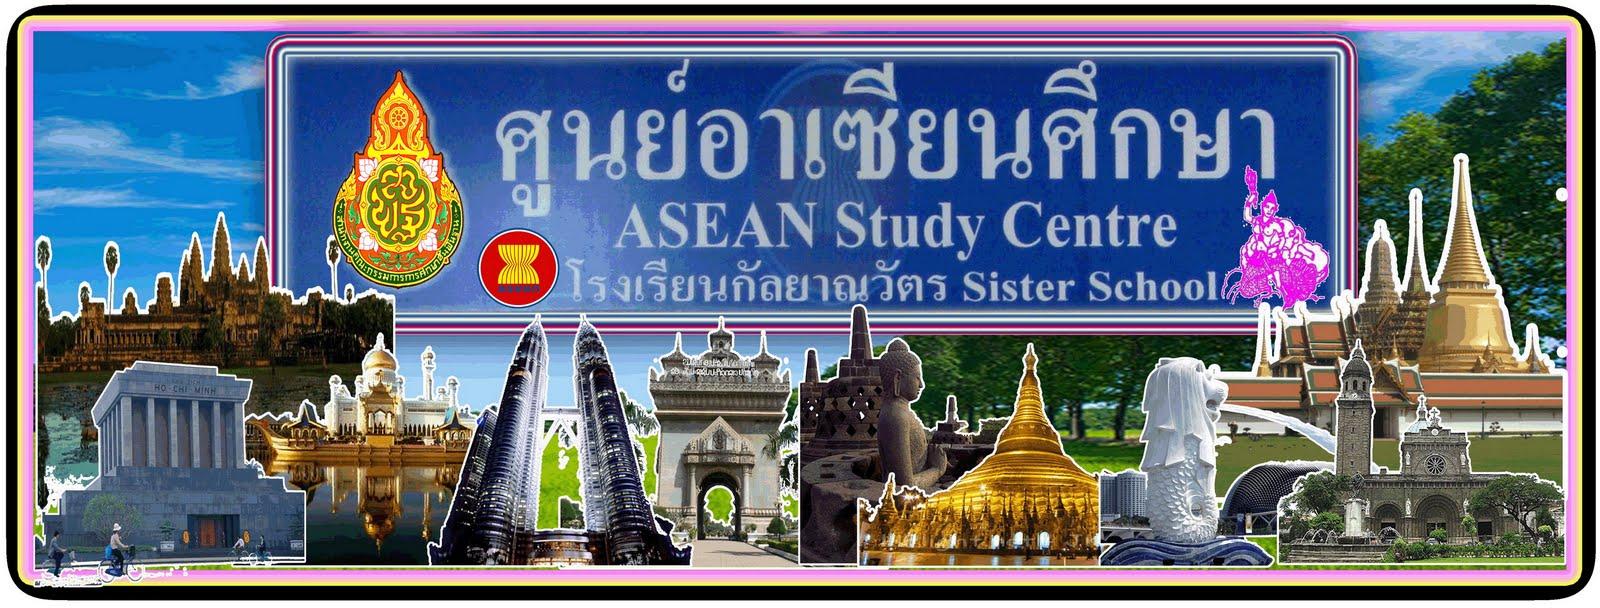 ASEAN STUDY CENTRE KANLAYANAWAT SCHOOL